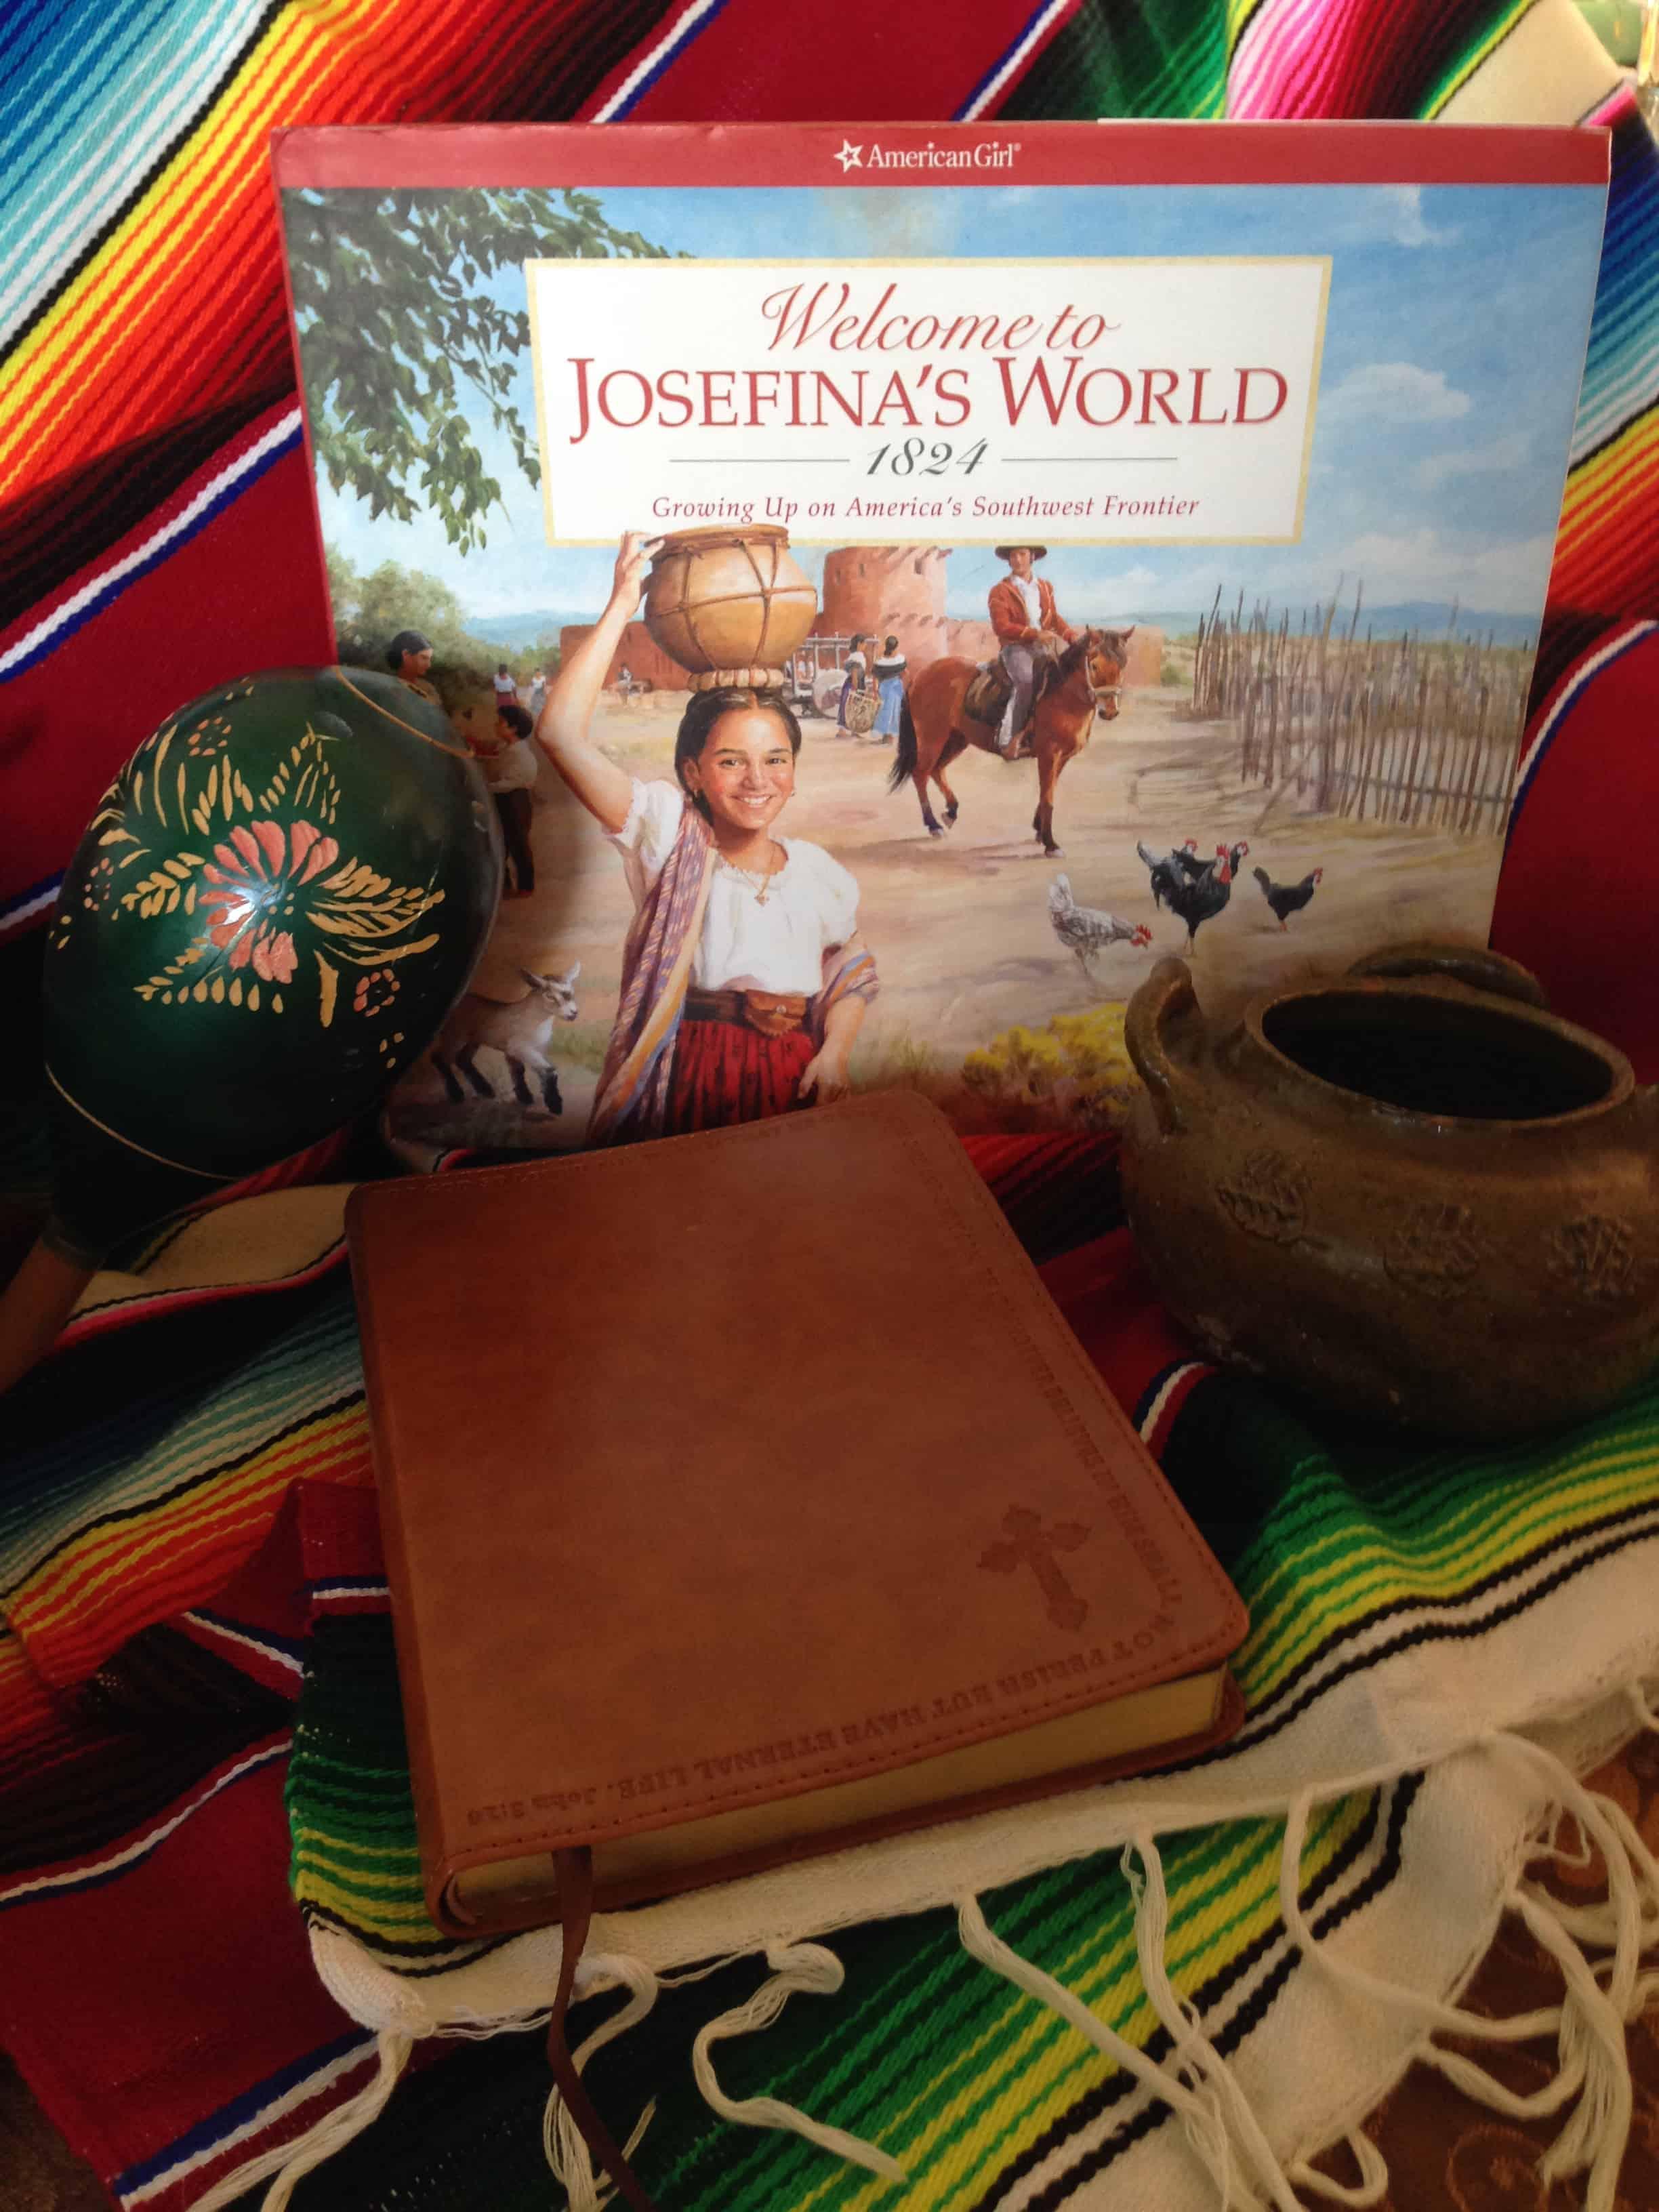 josefina unit study americas southwest frontier